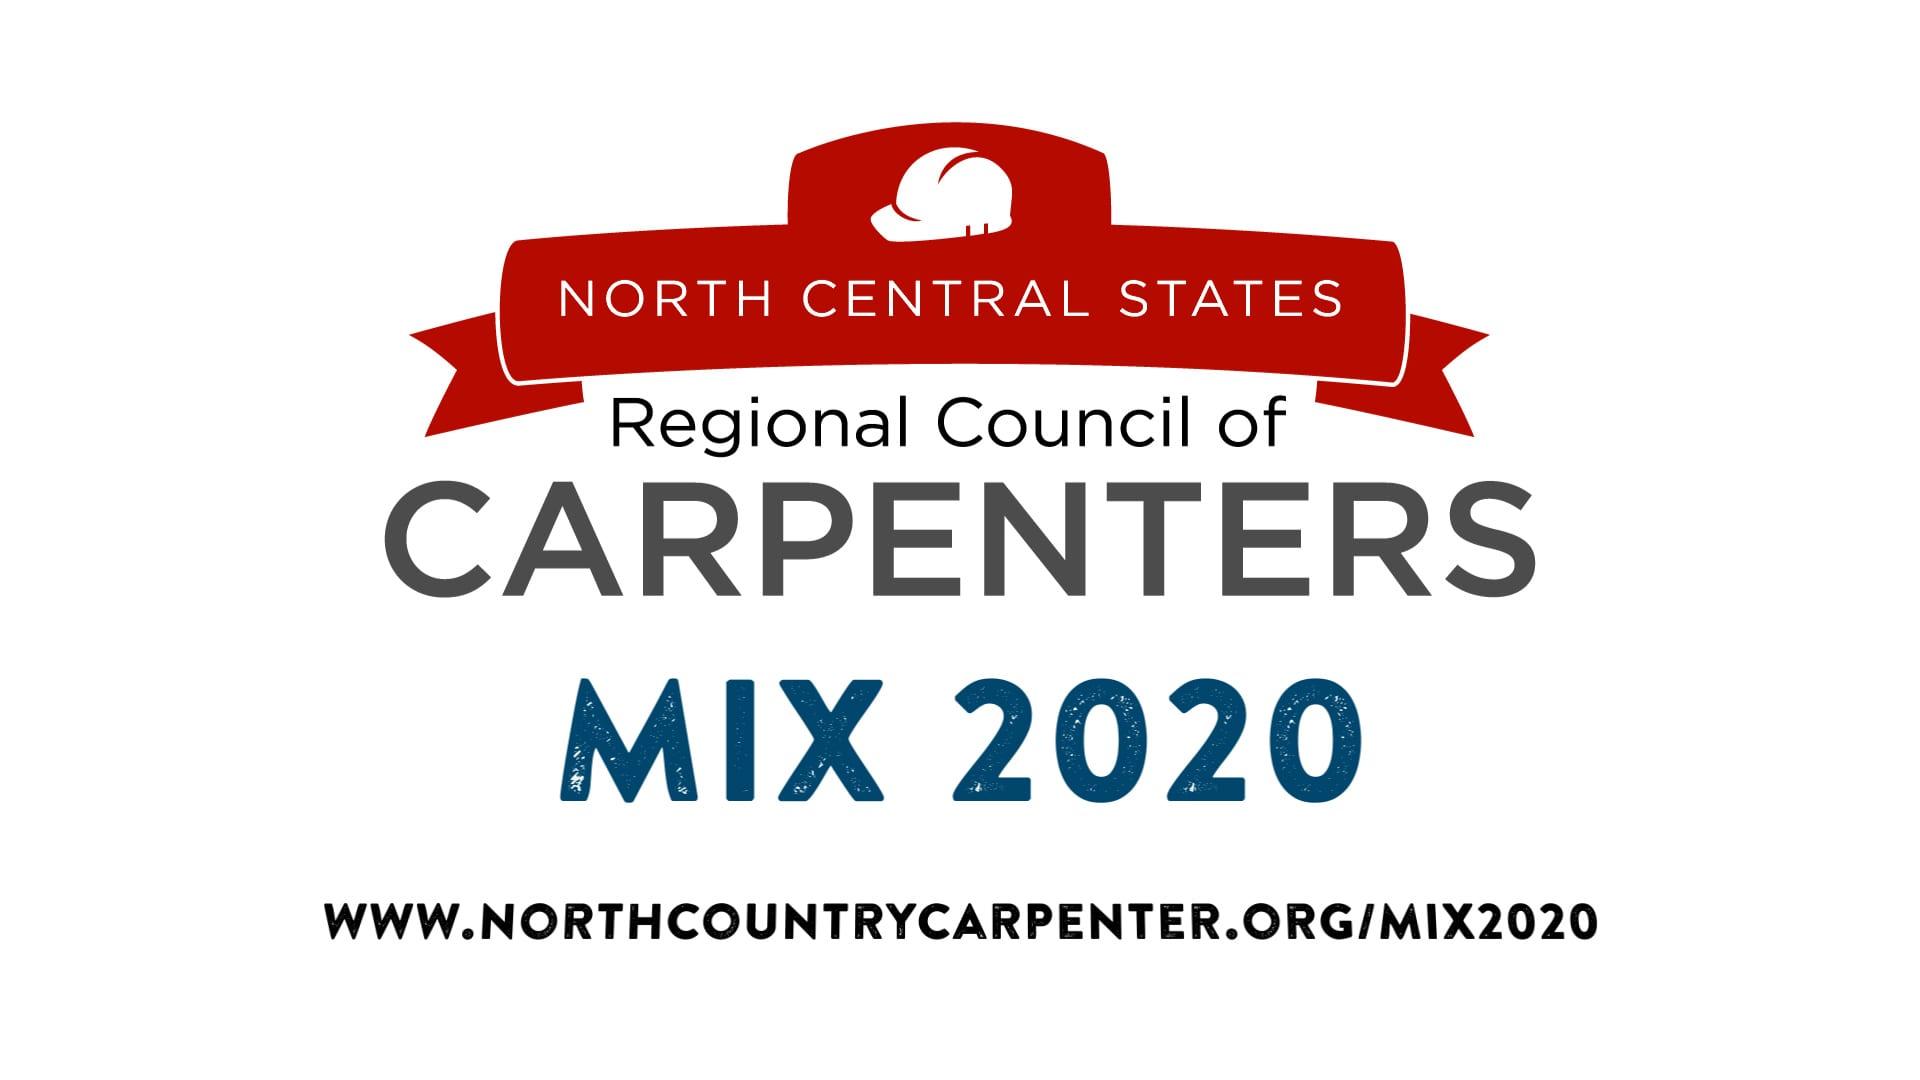 Carpenters Union – Mix 2020